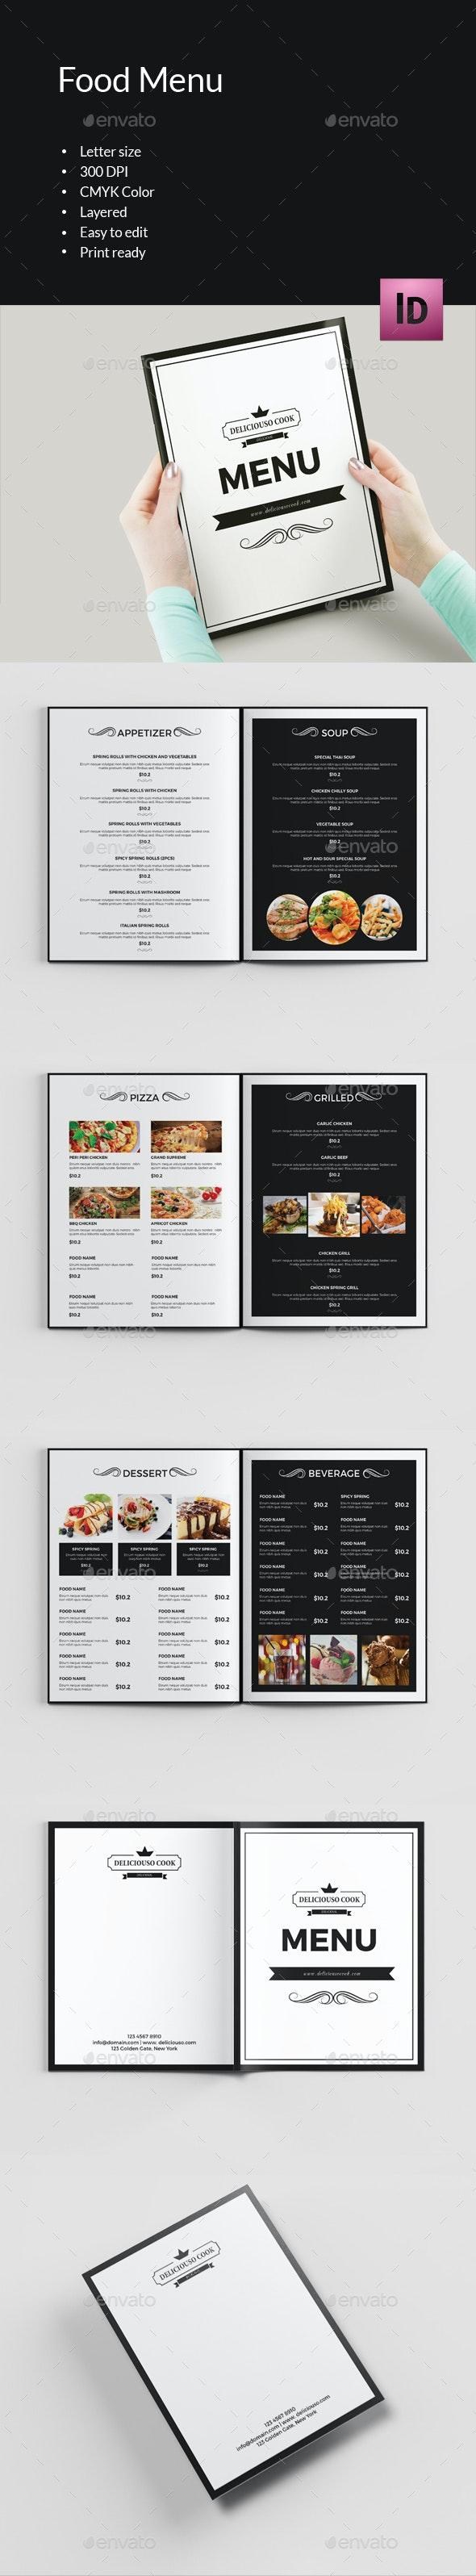 Food Menu Brochure-V396 - Food Menus Print Templates